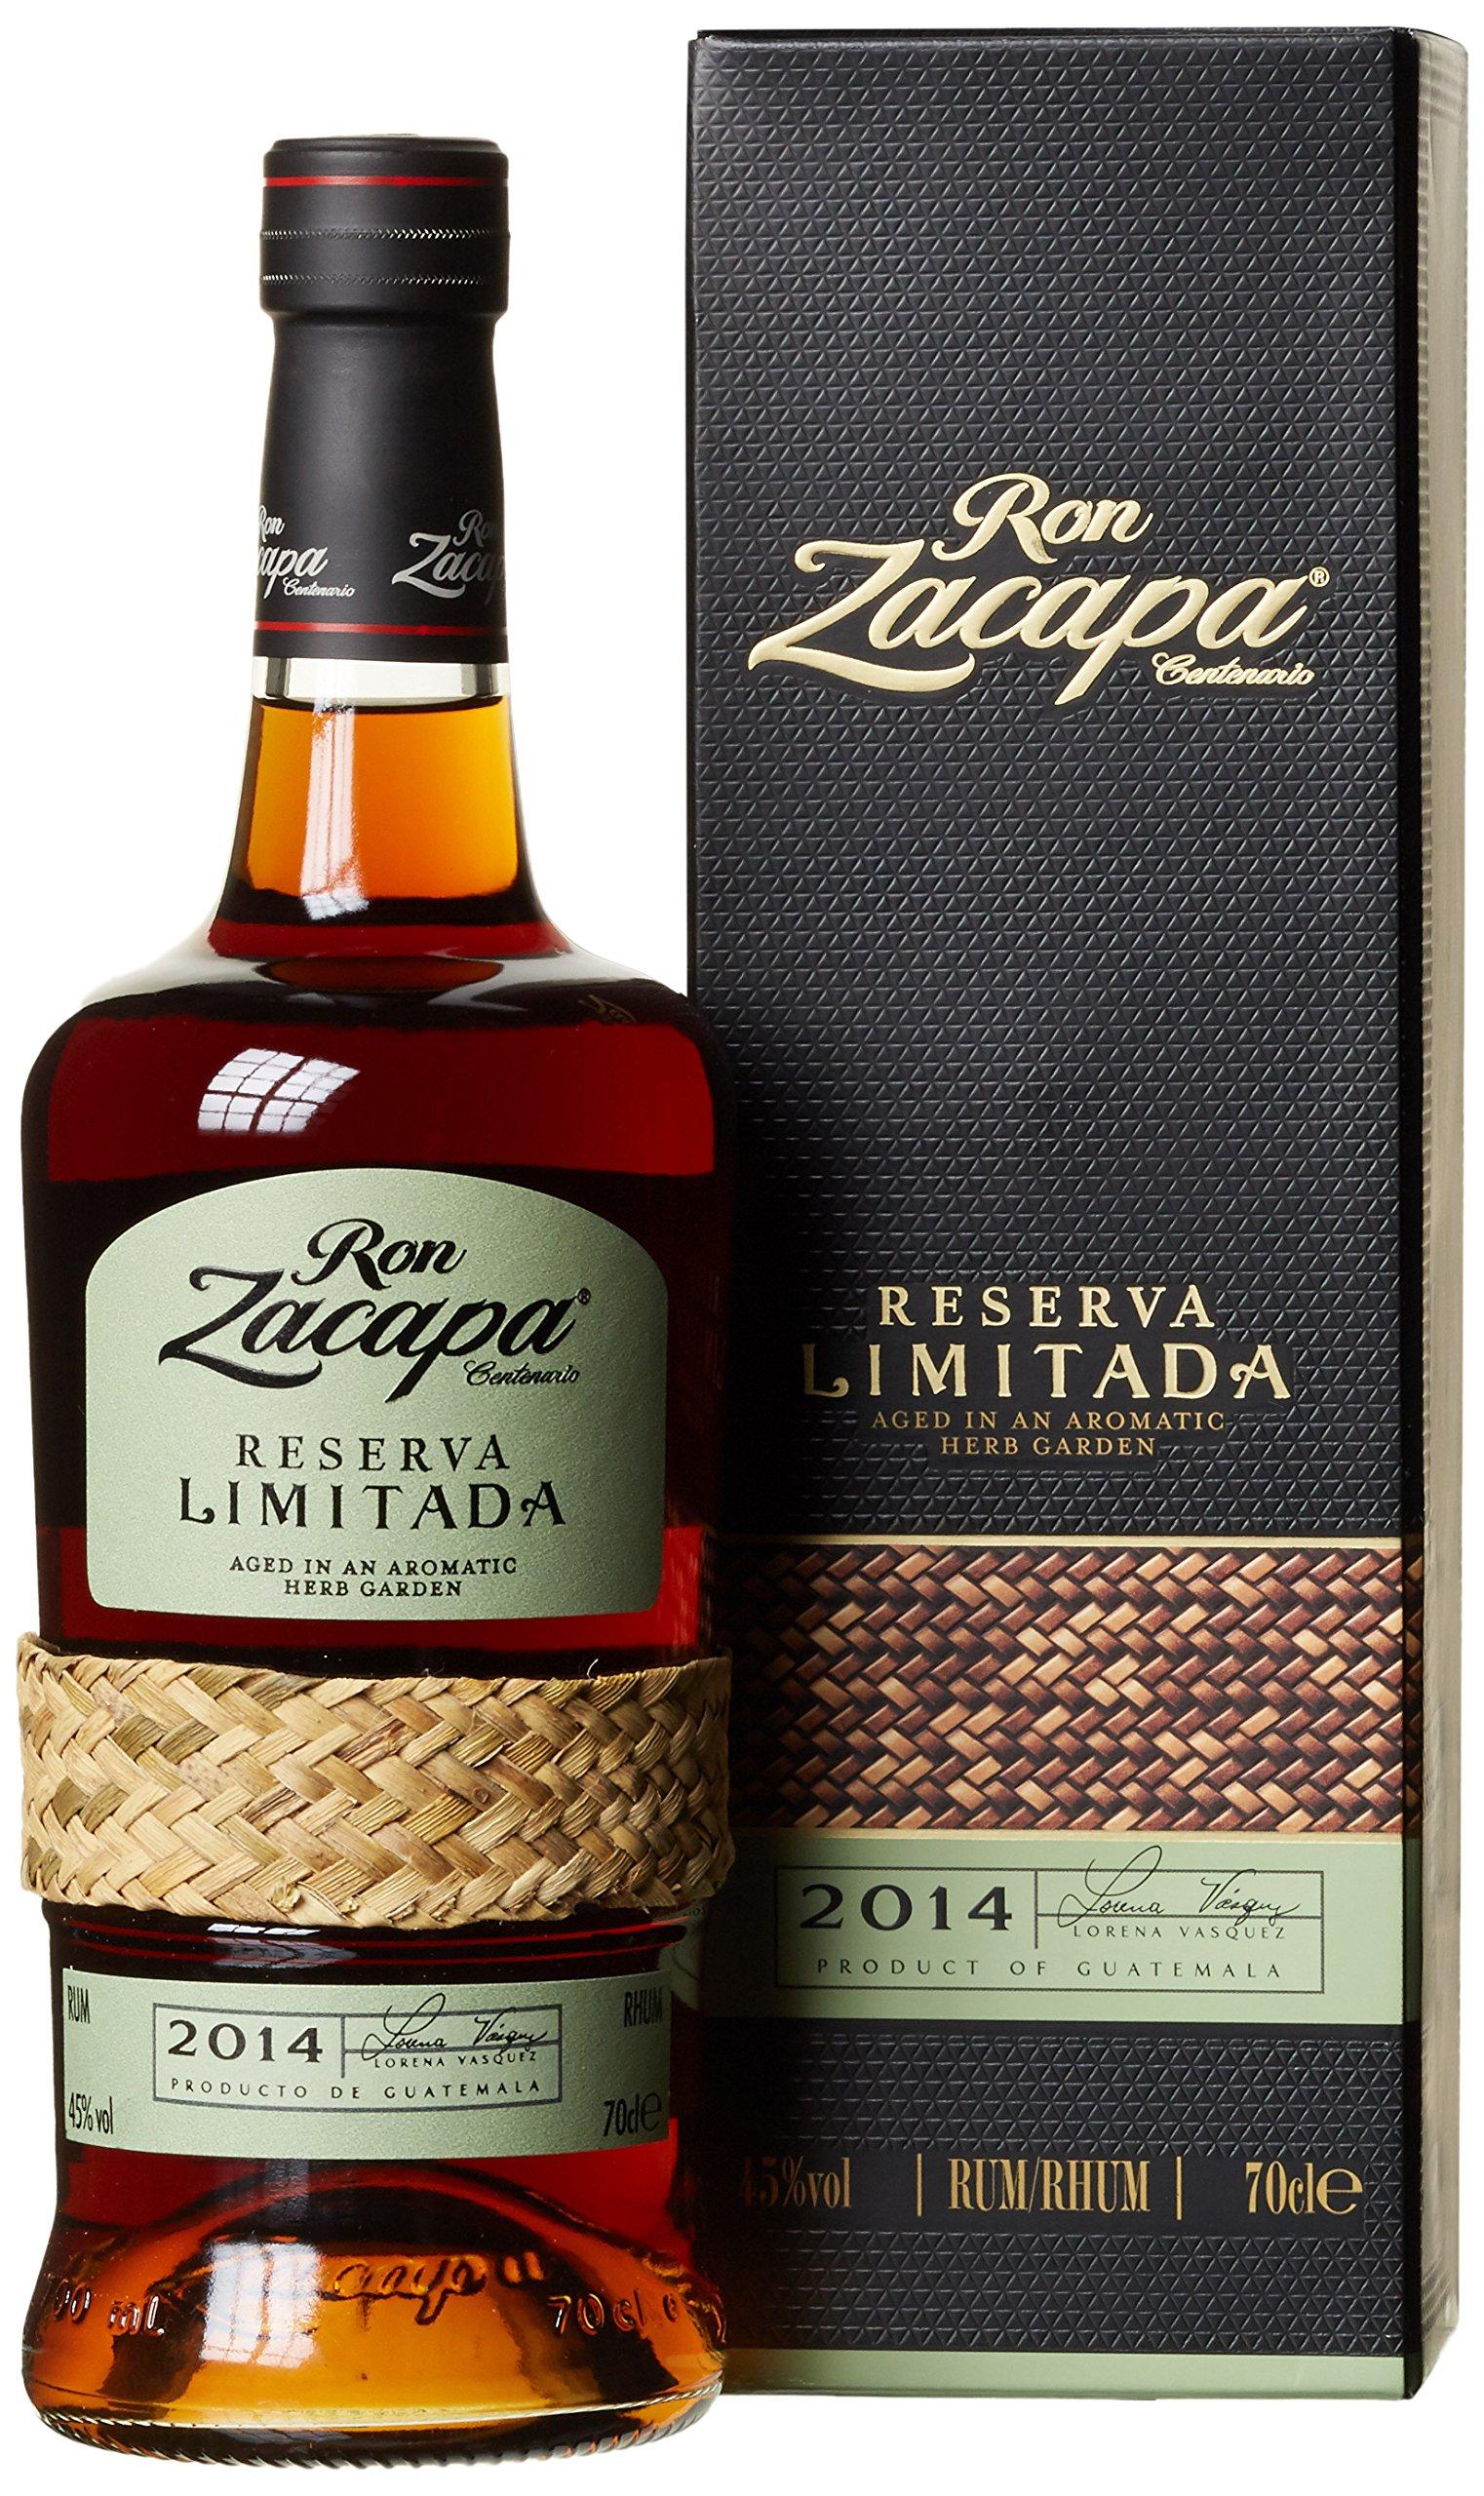 Ron-Zacapa-Centenario-Reserva-Limitada-2014-Rum-1-x-07-l